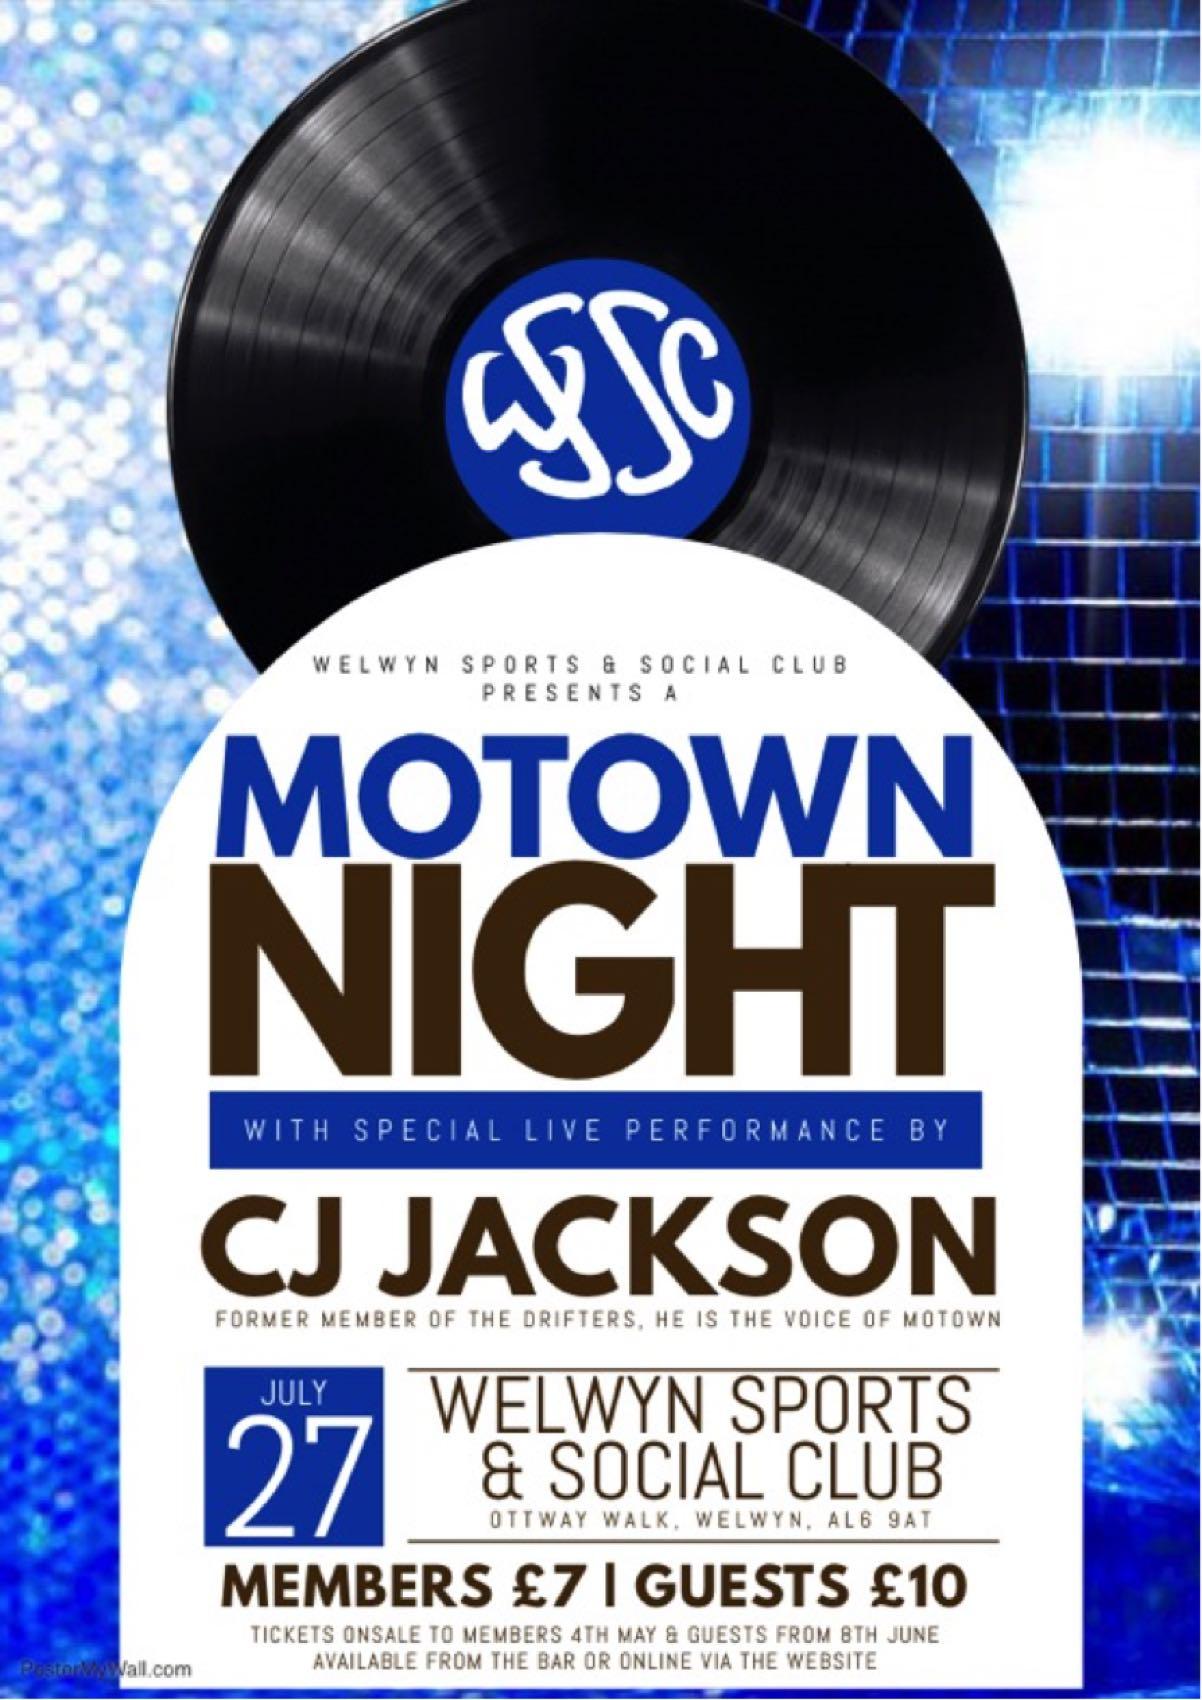 Soul & Motown Night with CJ Jackson banner image